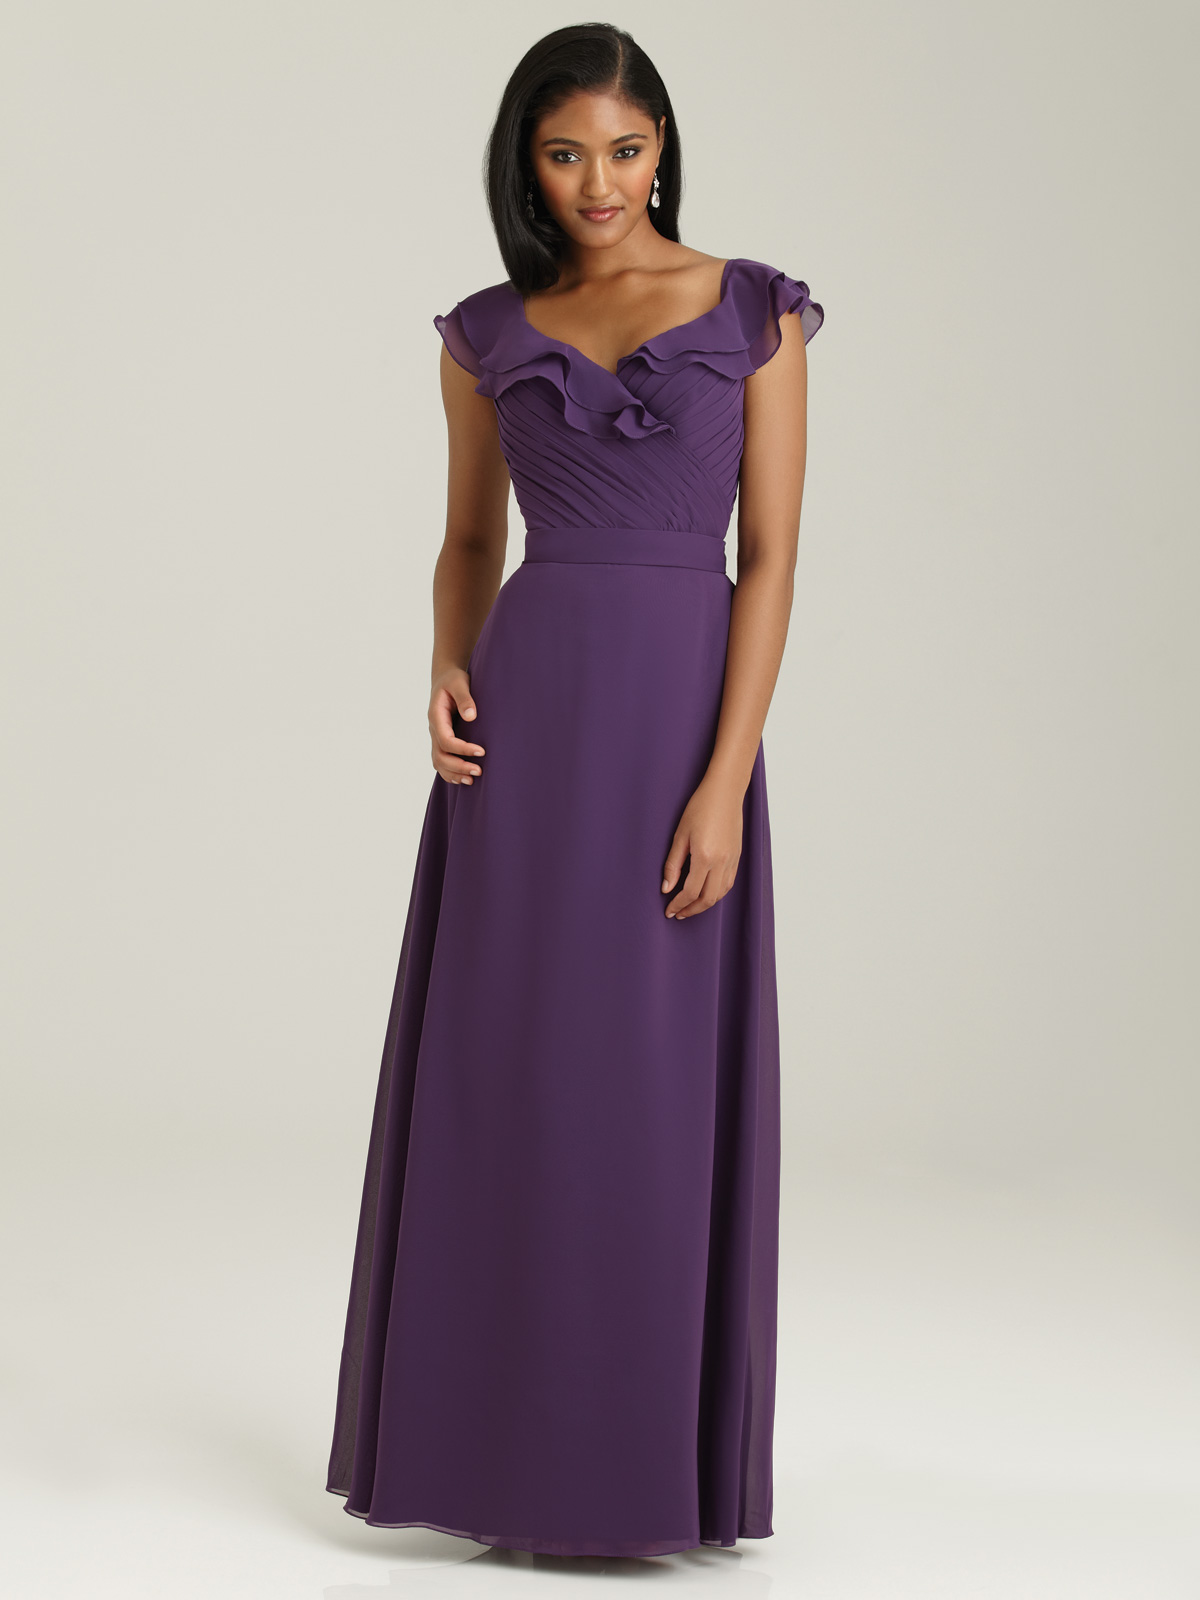 Purple chiffon bridesmaid dresses.